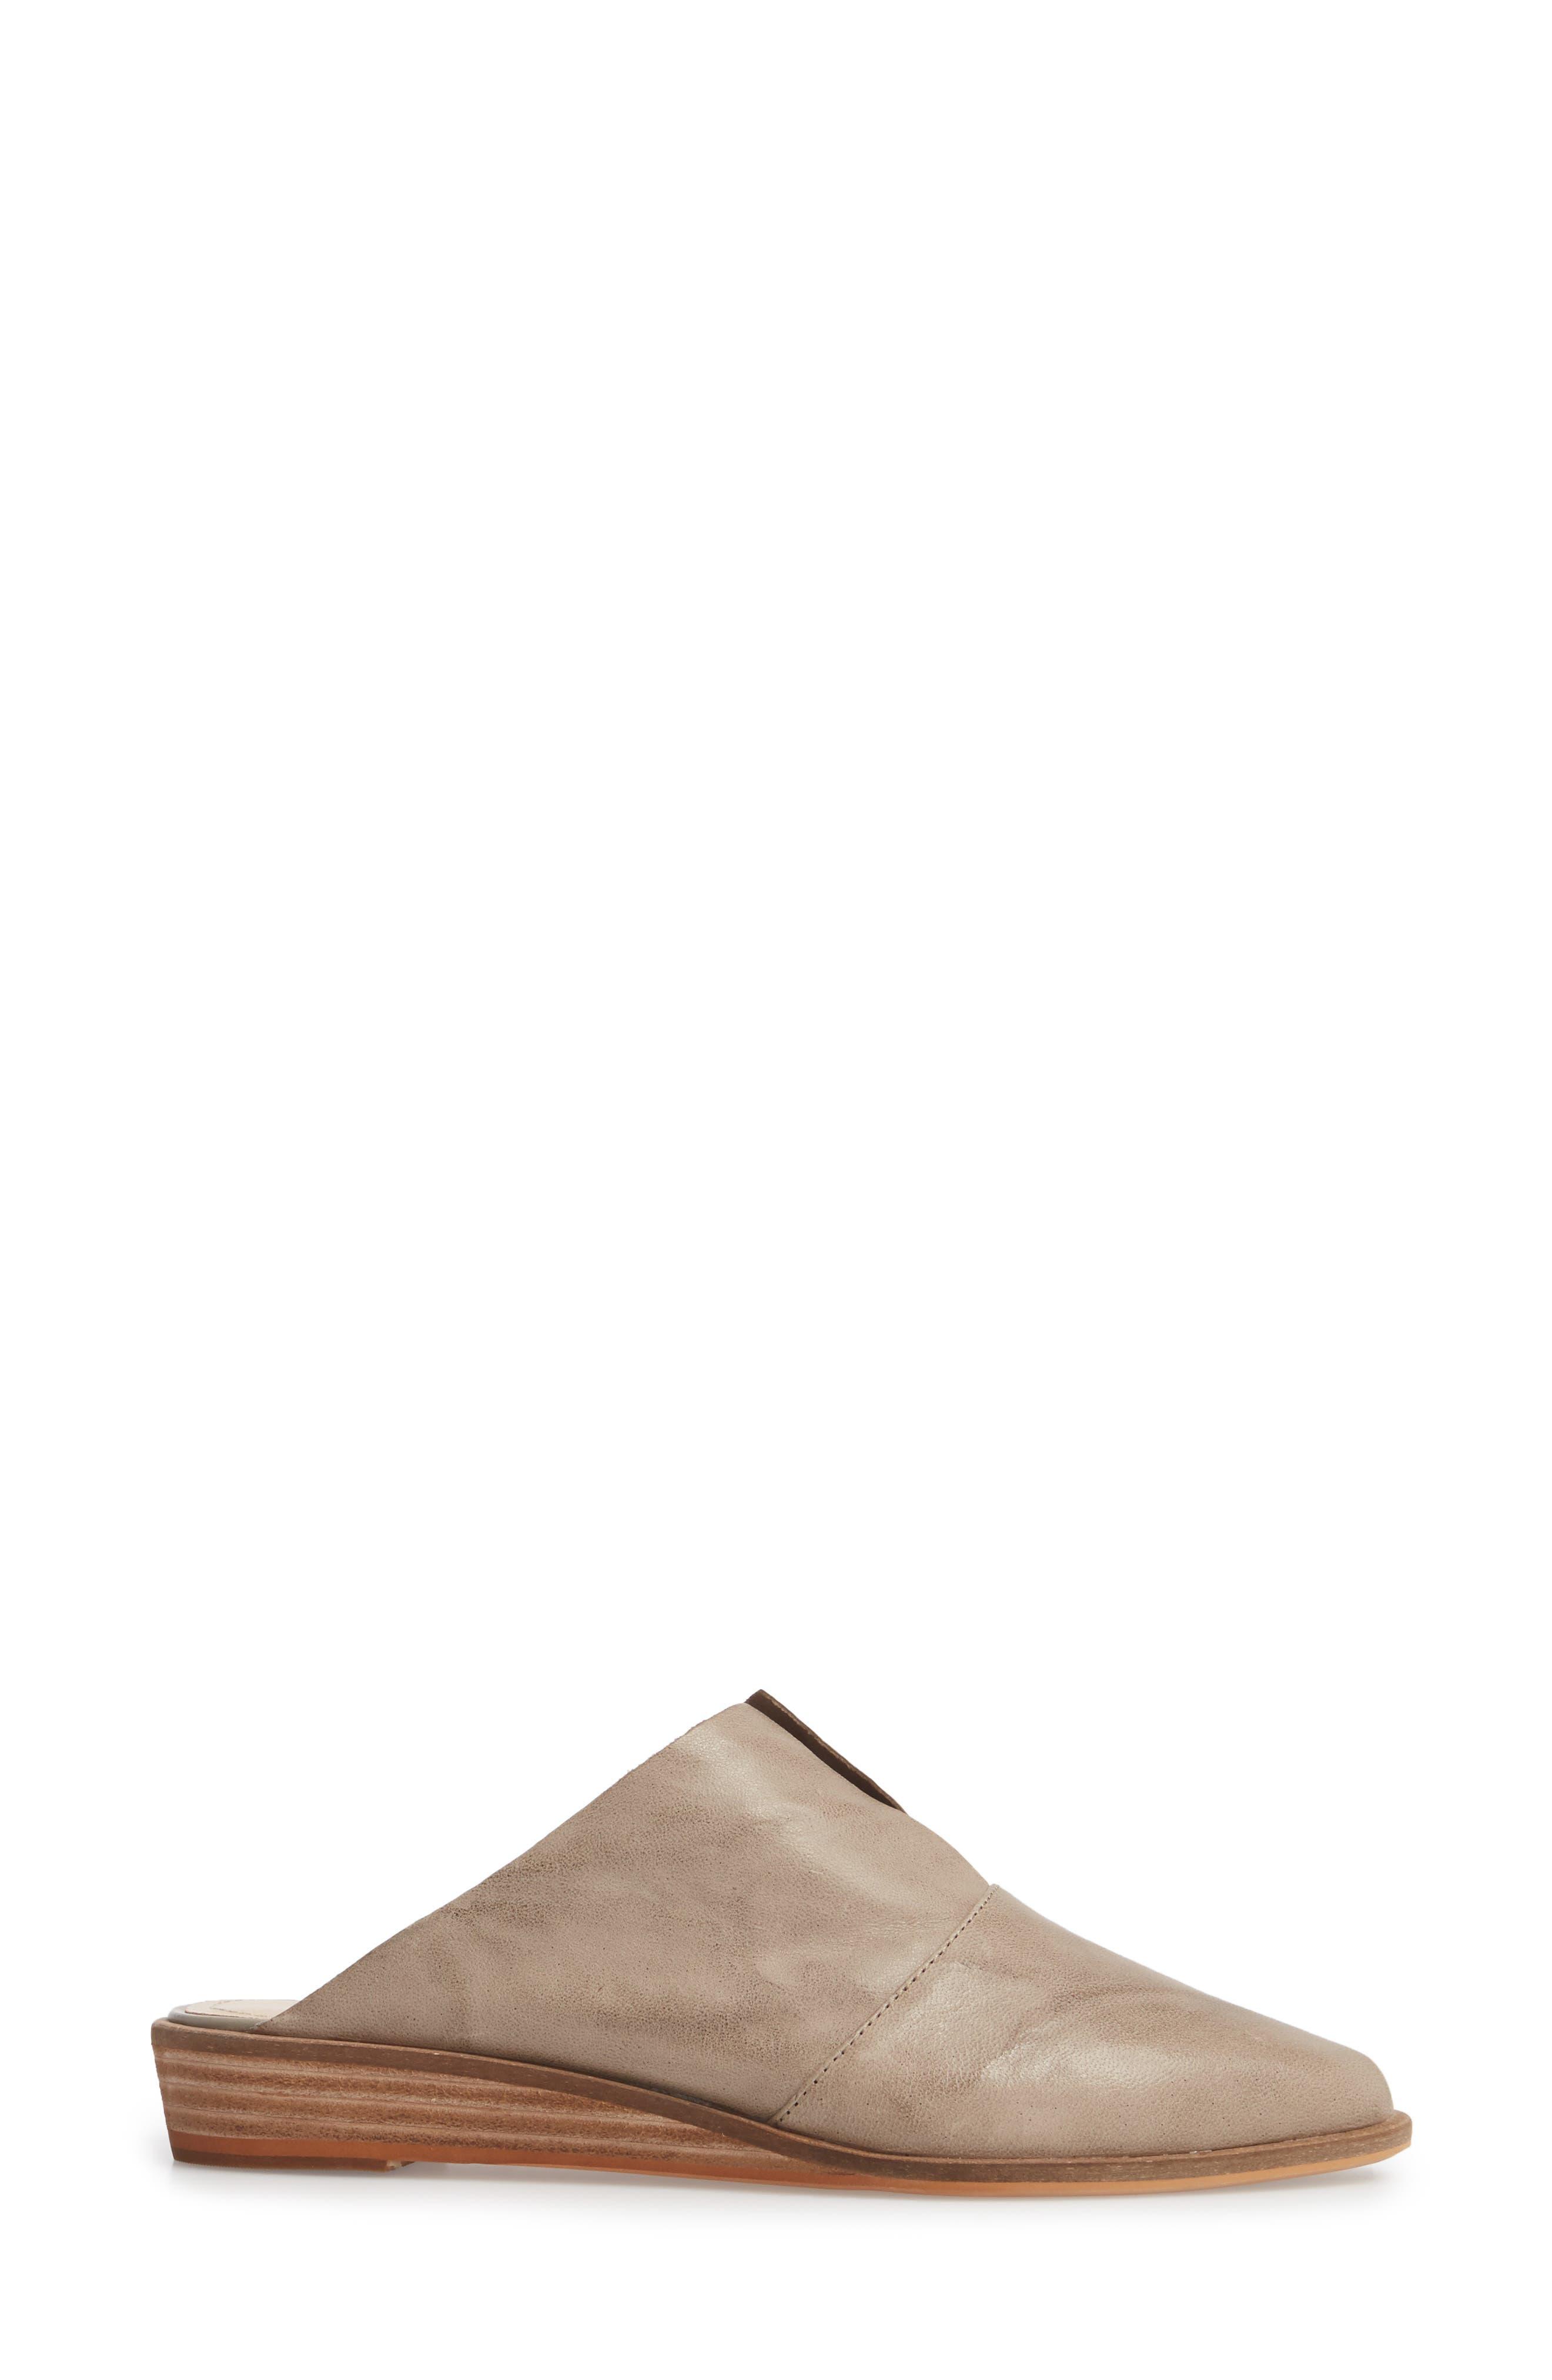 Kelsi Dagger Women's Ashland Mule q5Tf5